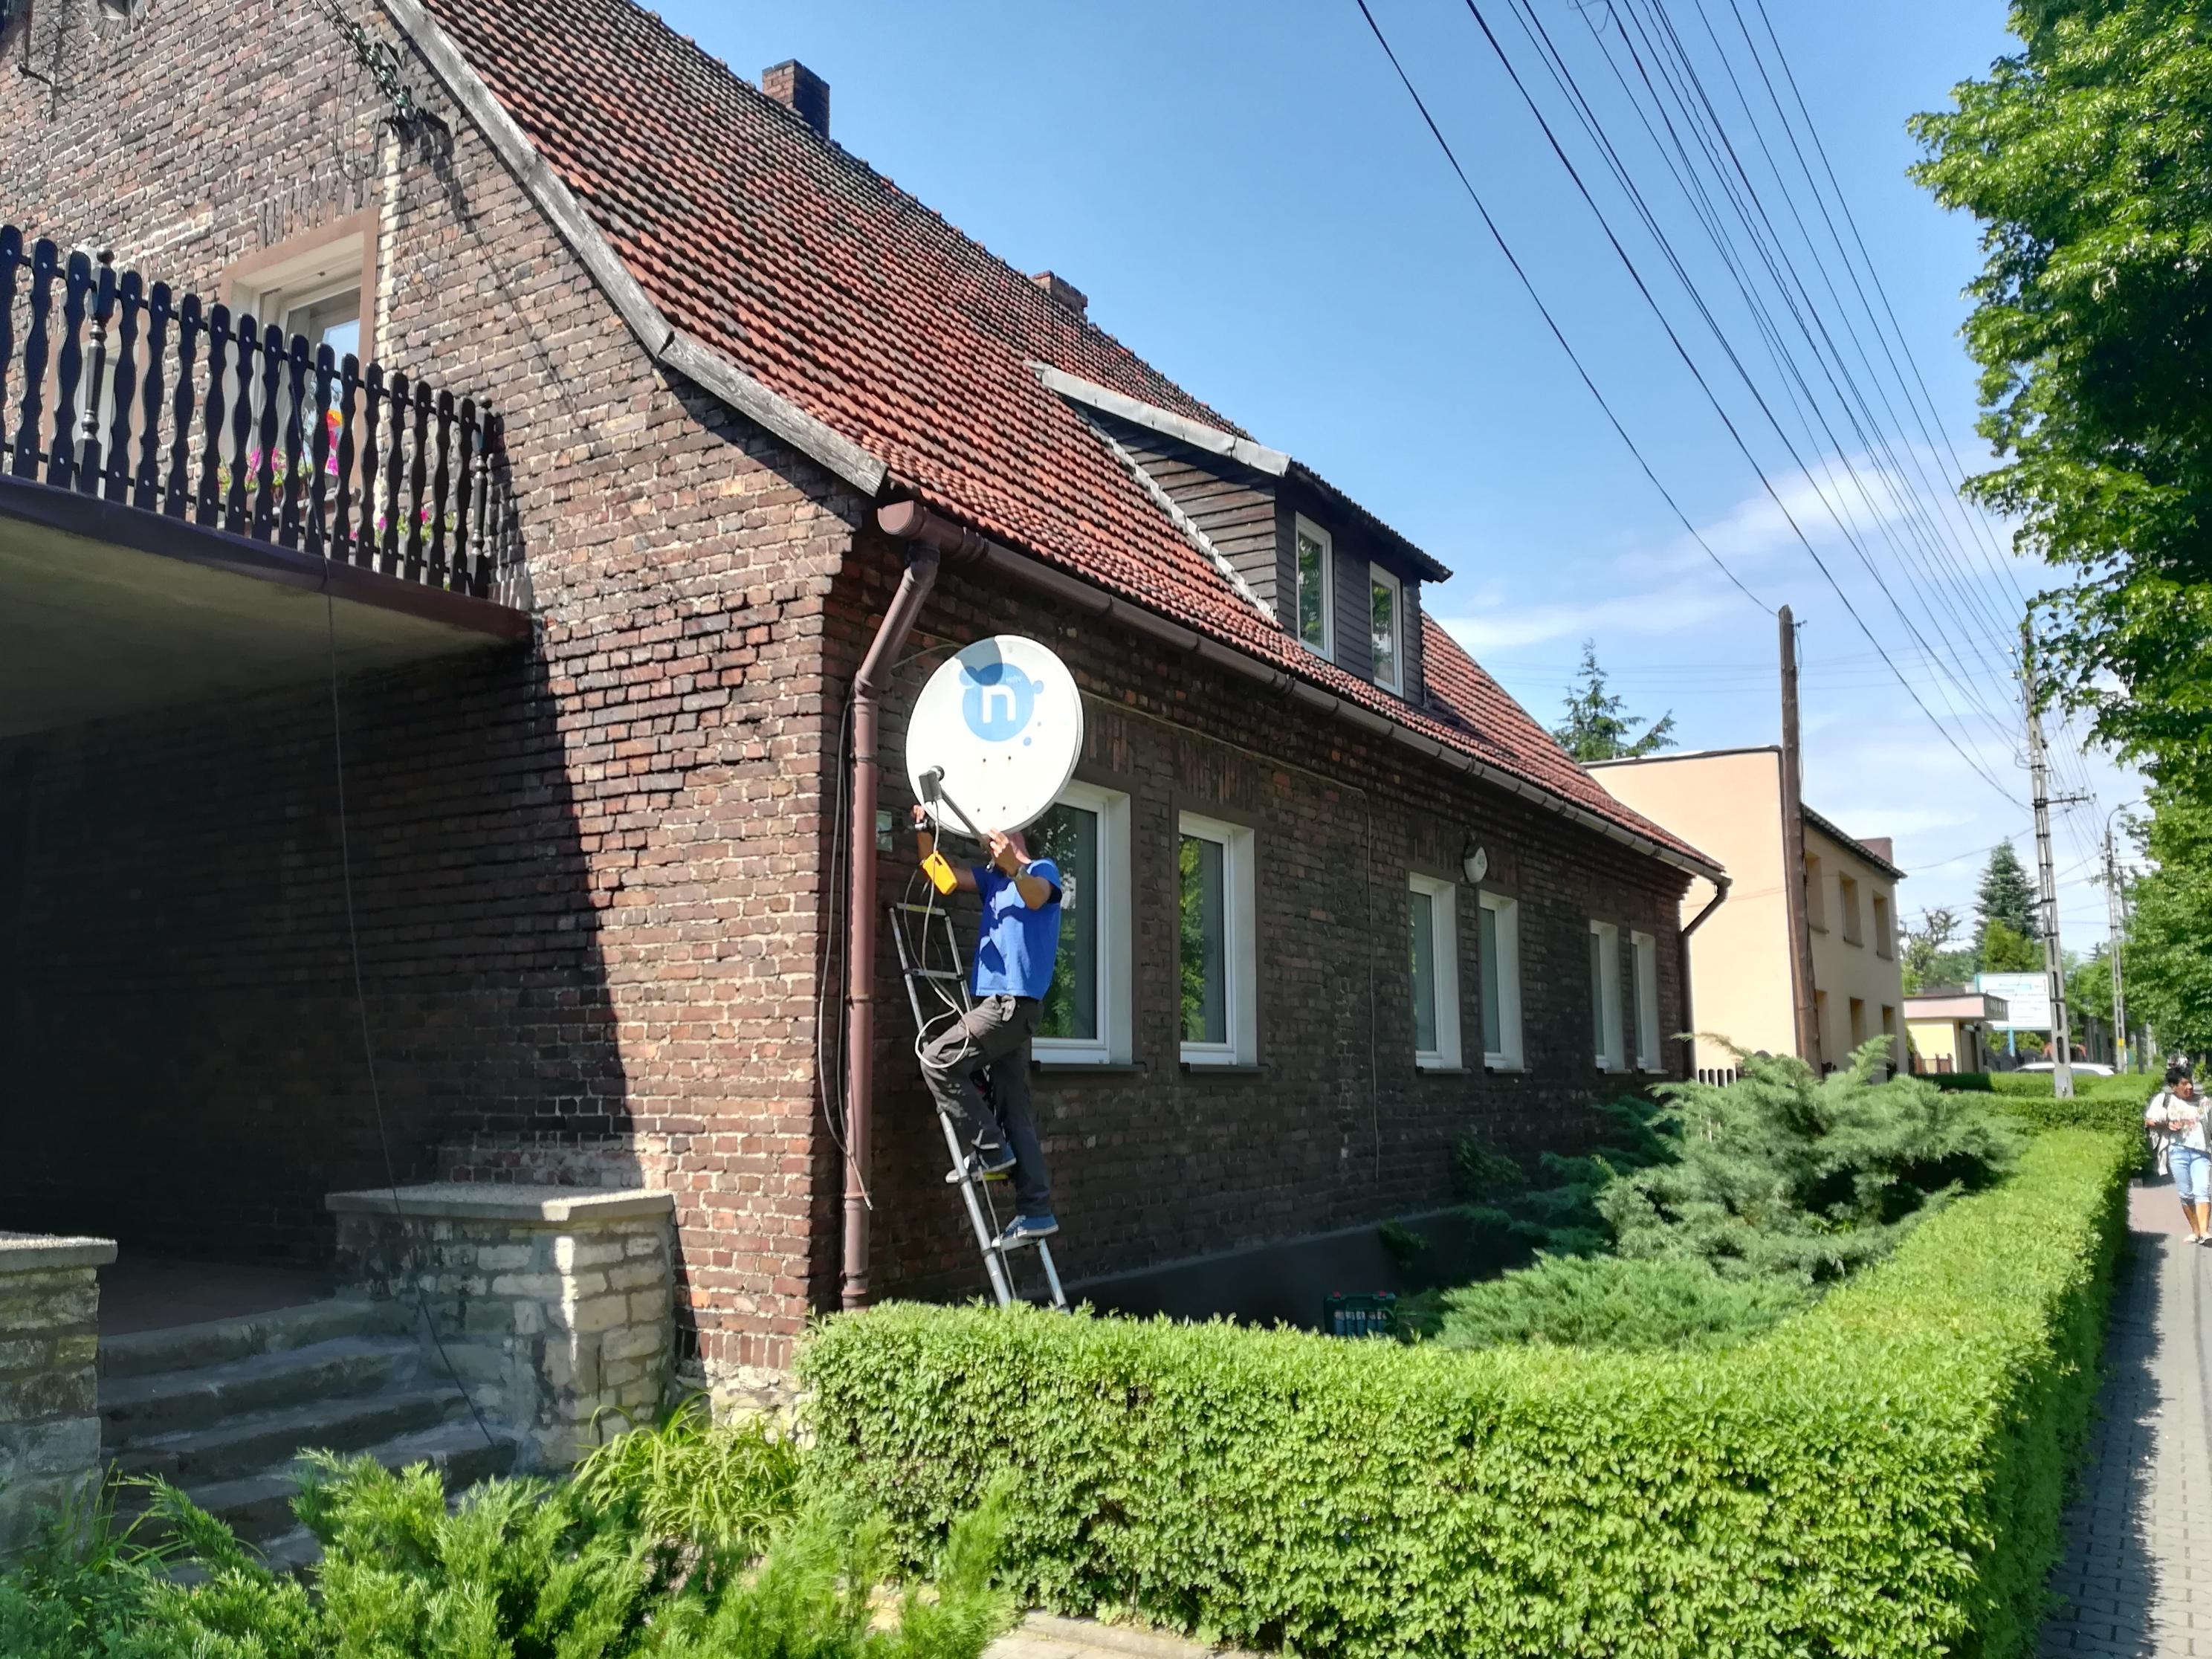 Antena Satelitarna Będzin